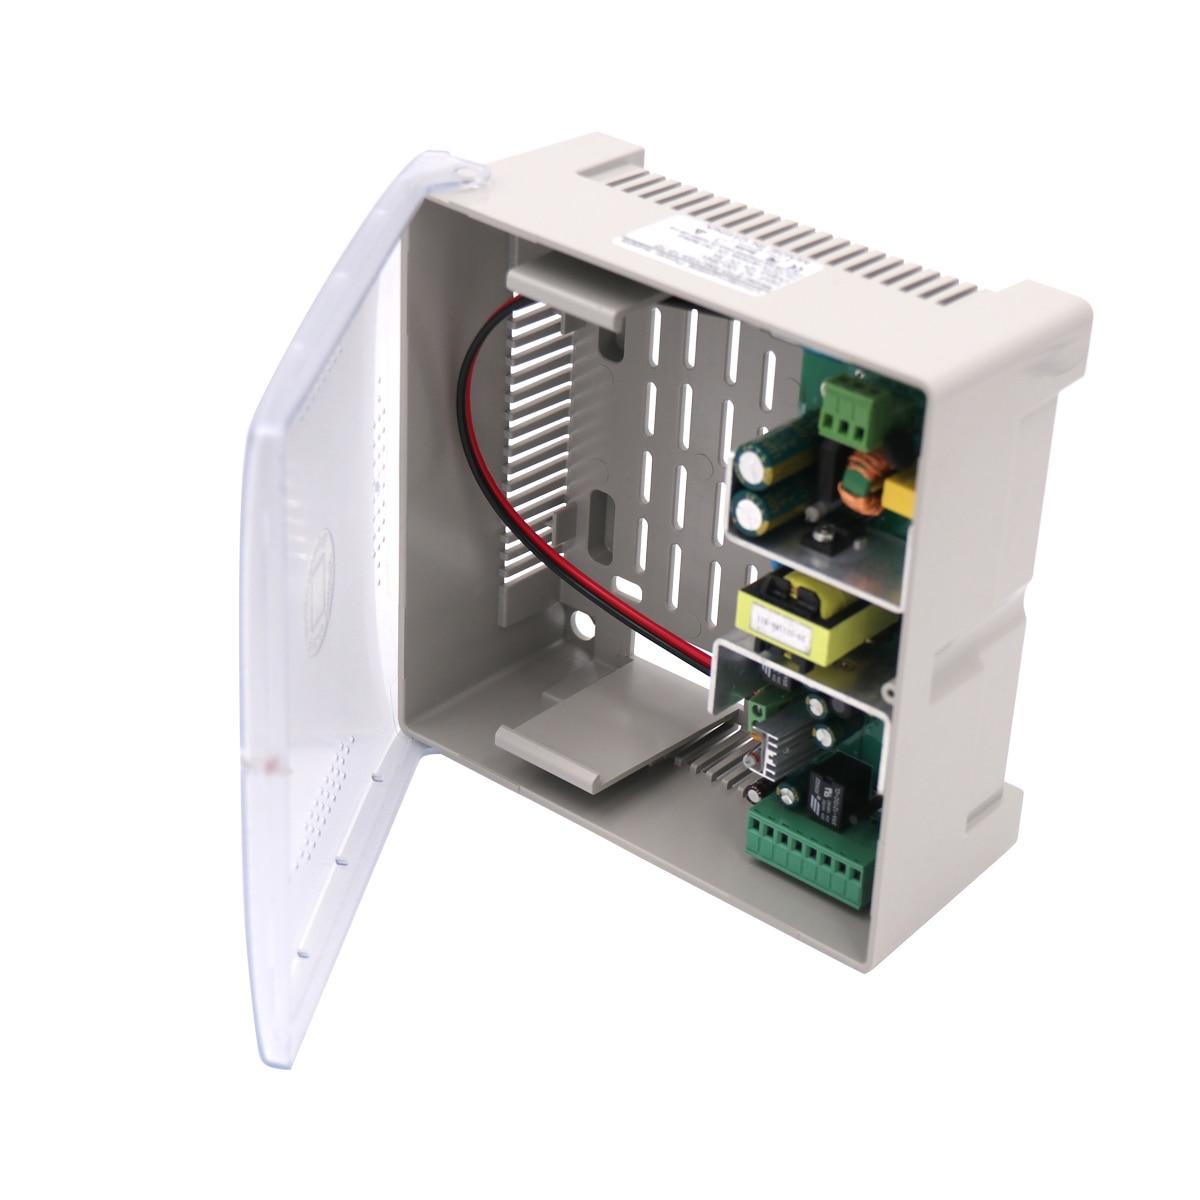 12V 3A Dual Output Power Supply  With Backup UPS 13.8V DC For Battery(7AH) Charging 12V For CCTV Cameras